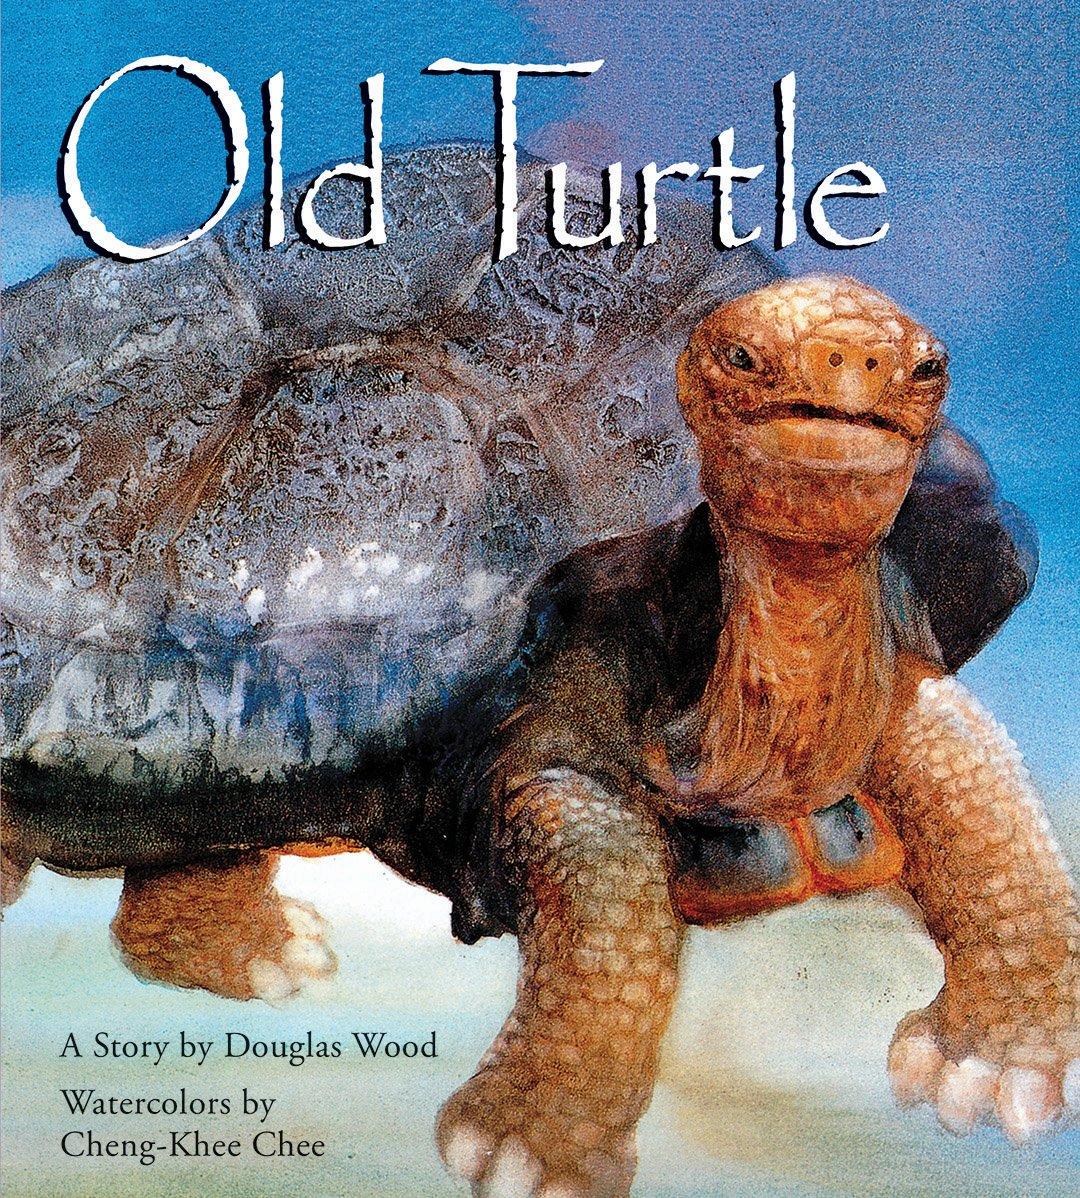 Old turtle douglas wood cheng khee chee 9780439309080 amazon old turtle douglas wood cheng khee chee 9780439309080 amazon books biocorpaavc Choice Image